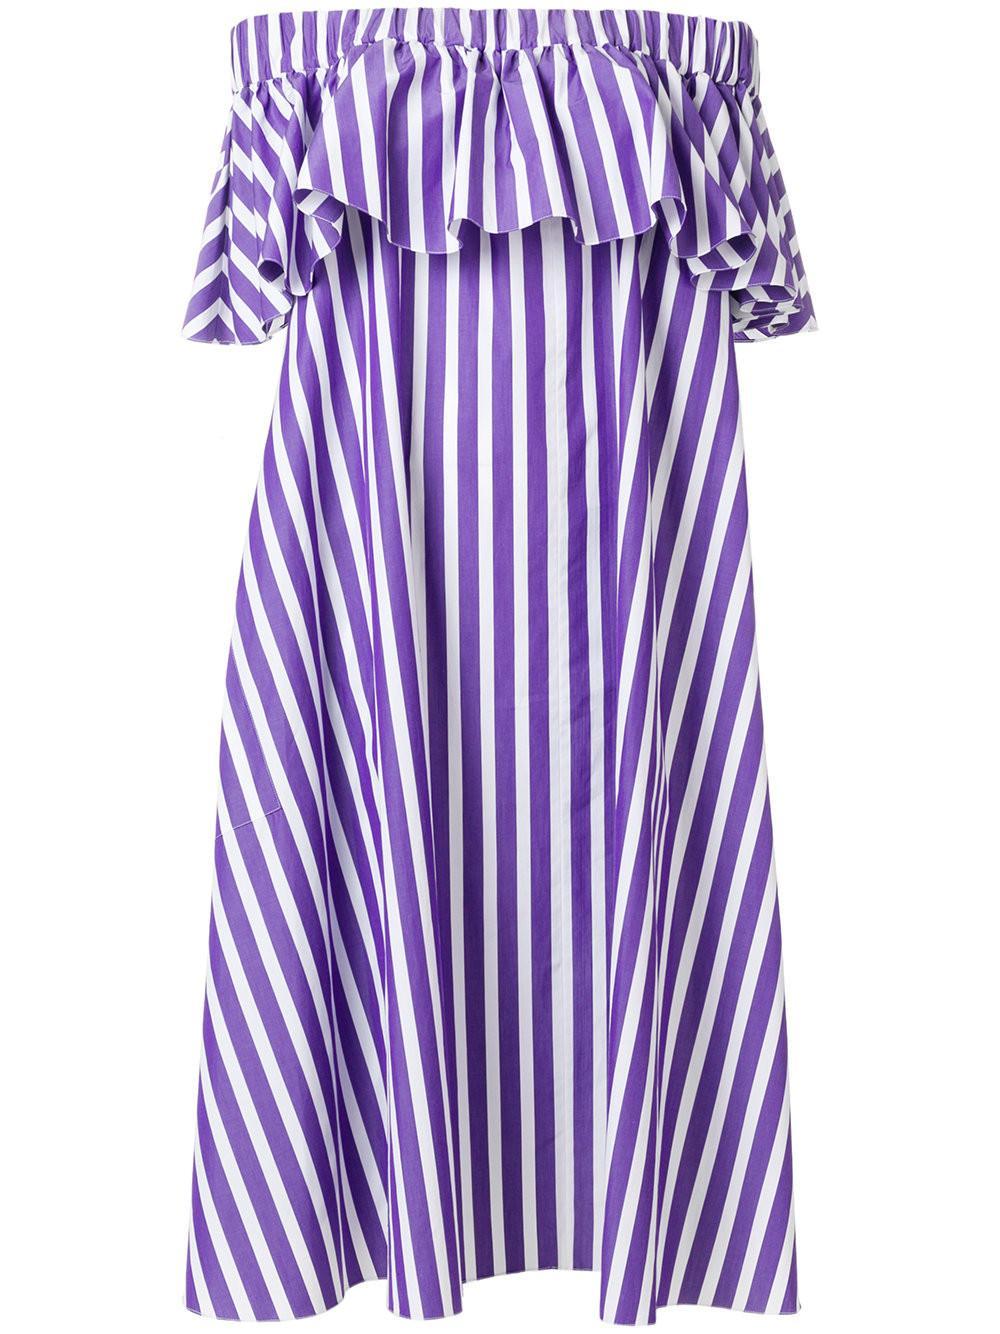 d93f8d231085 Maison Rabih Kayrouz Purple Striped Off-Shoulder Dress In Pink ...